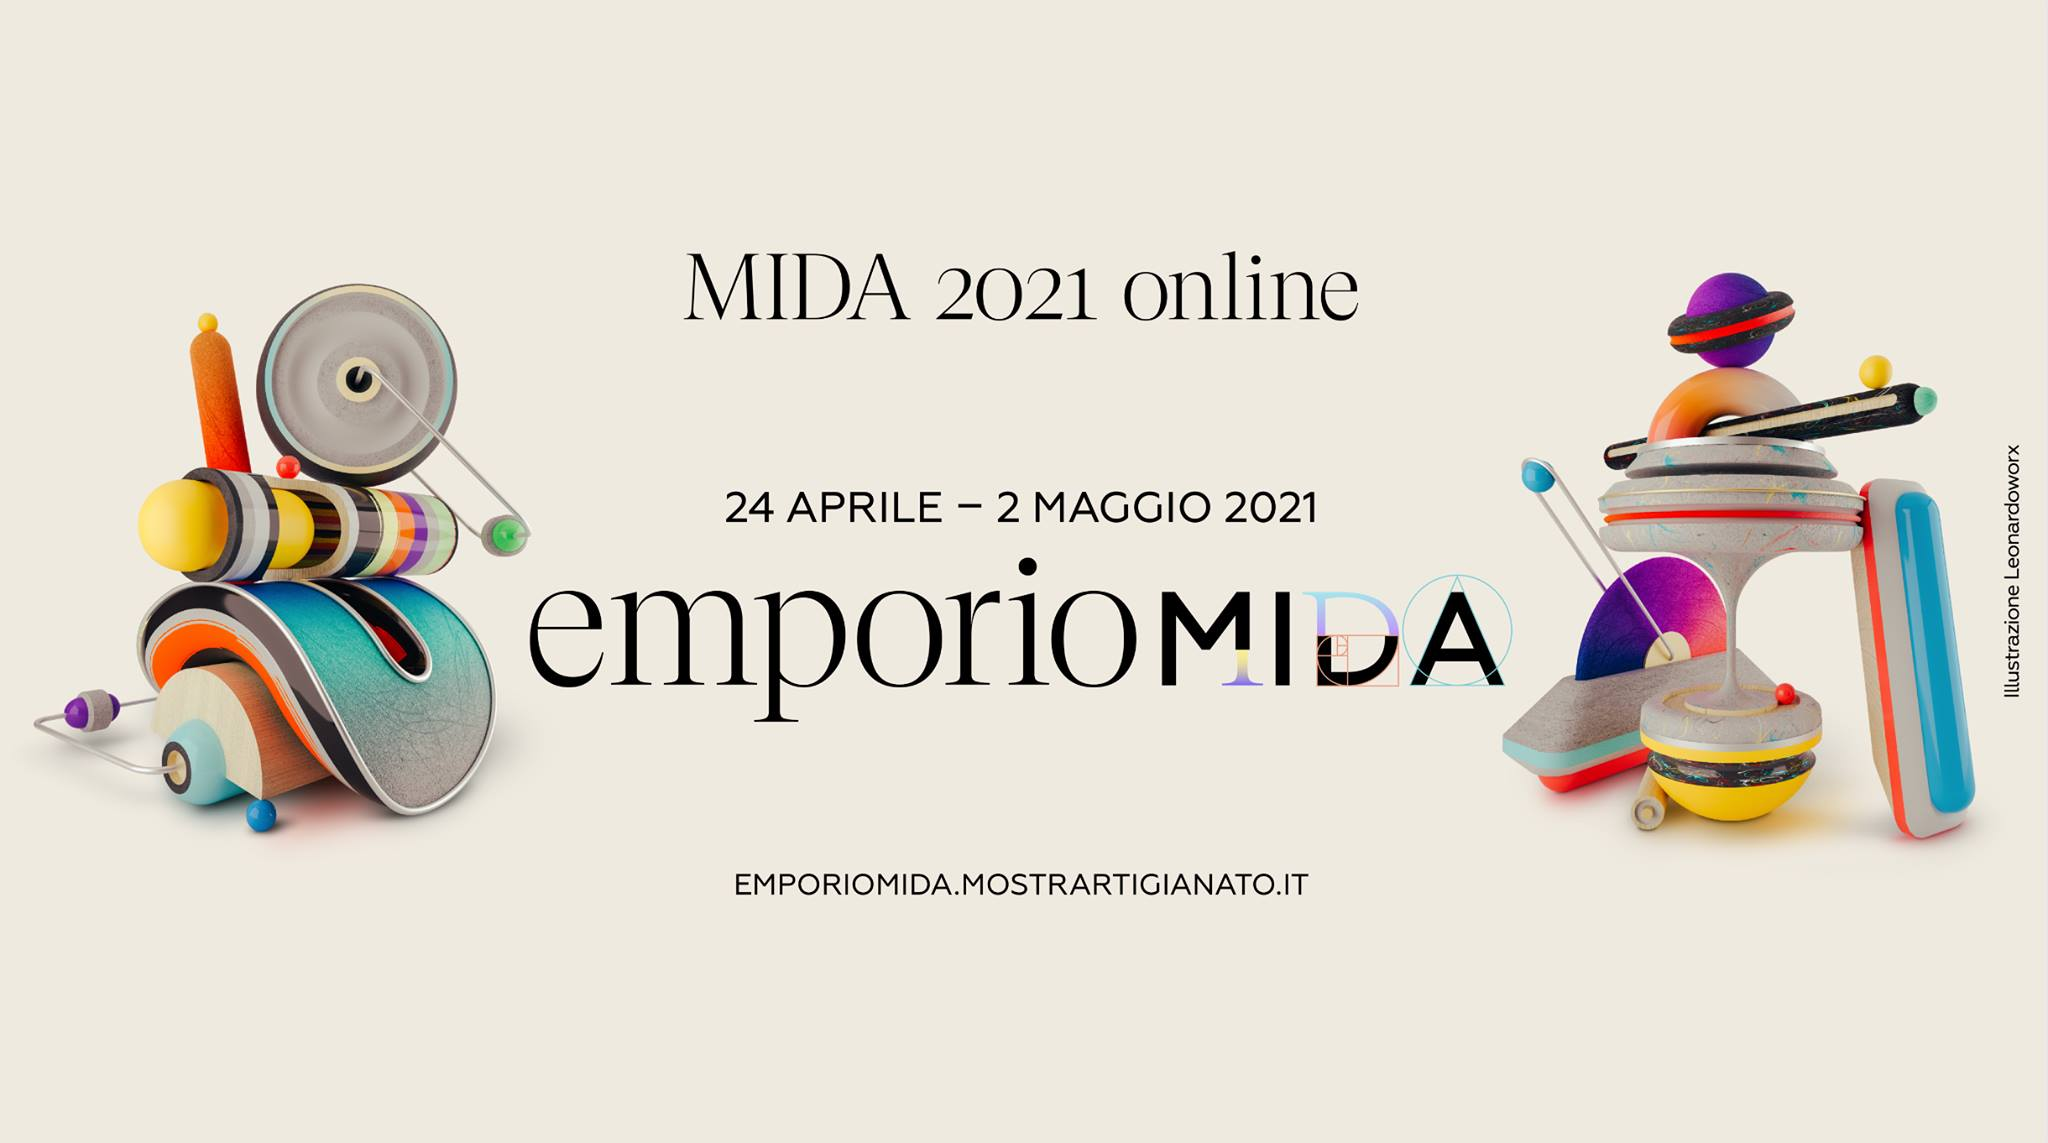 Emporio MIDA 2021